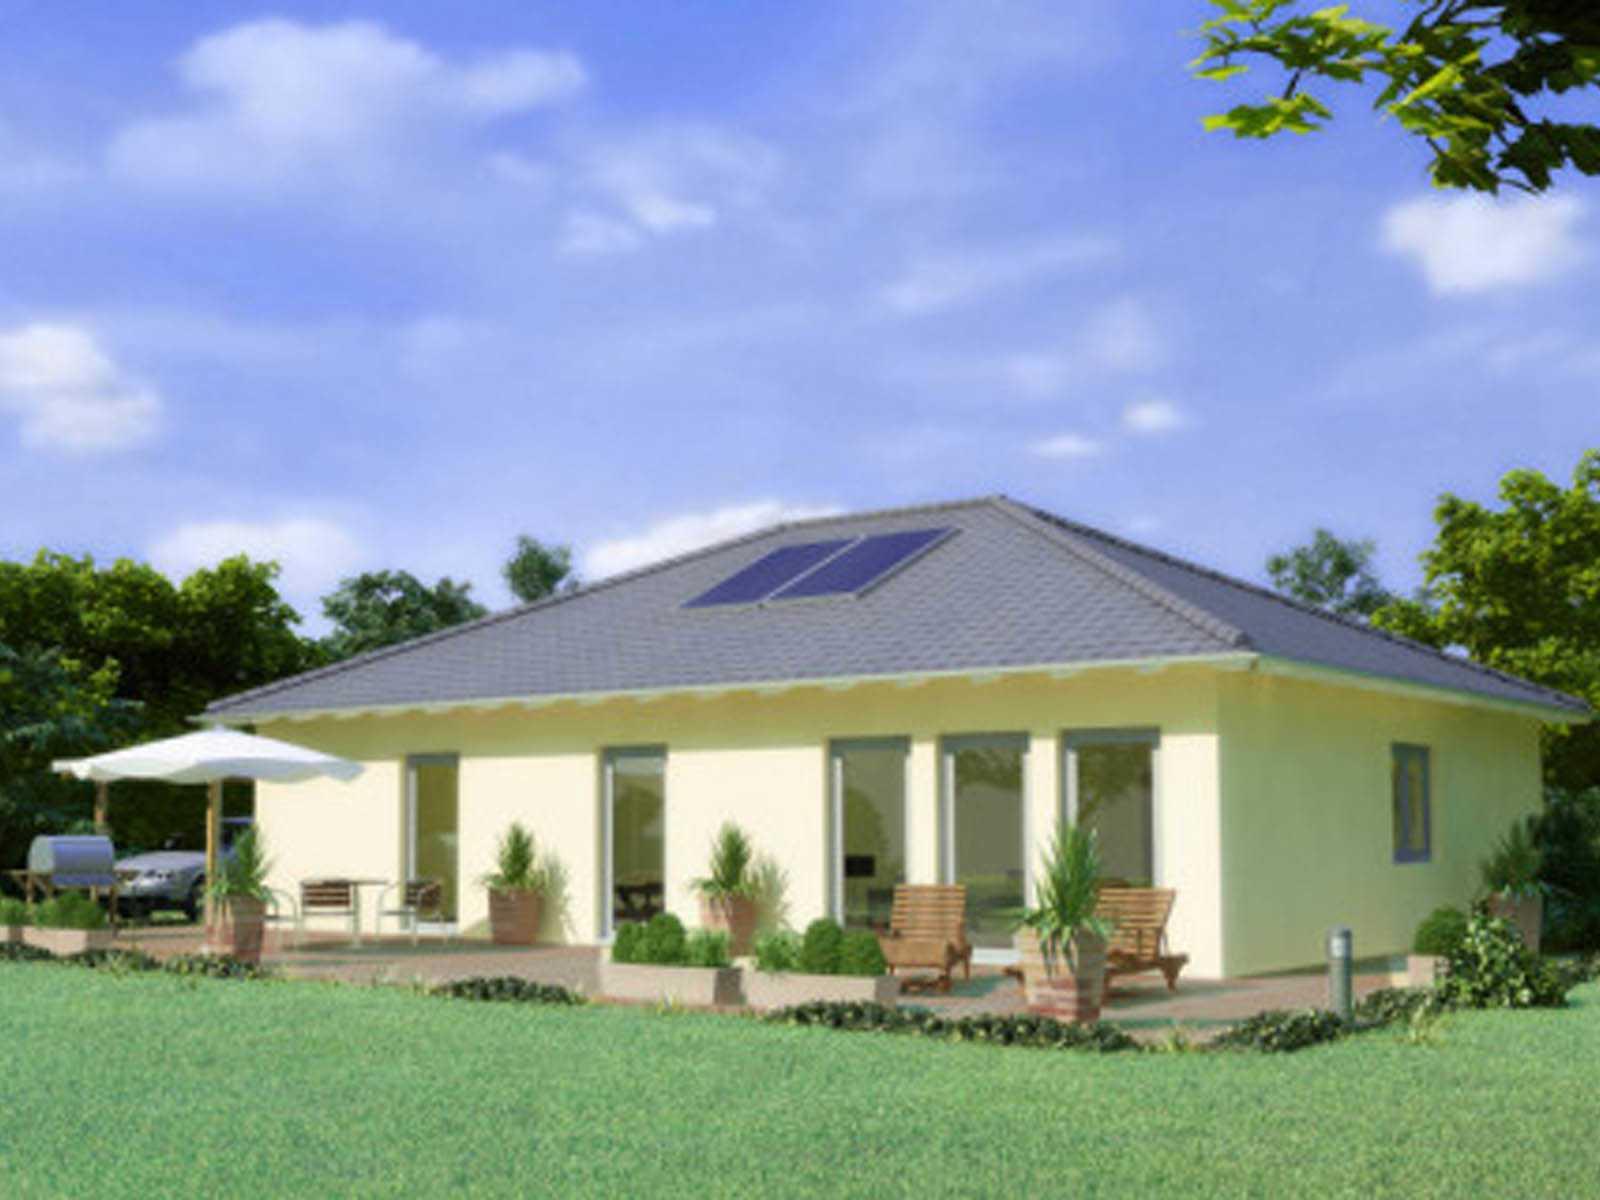 Haus chalet 103 favorit massivhaus for Chalet haus bauen